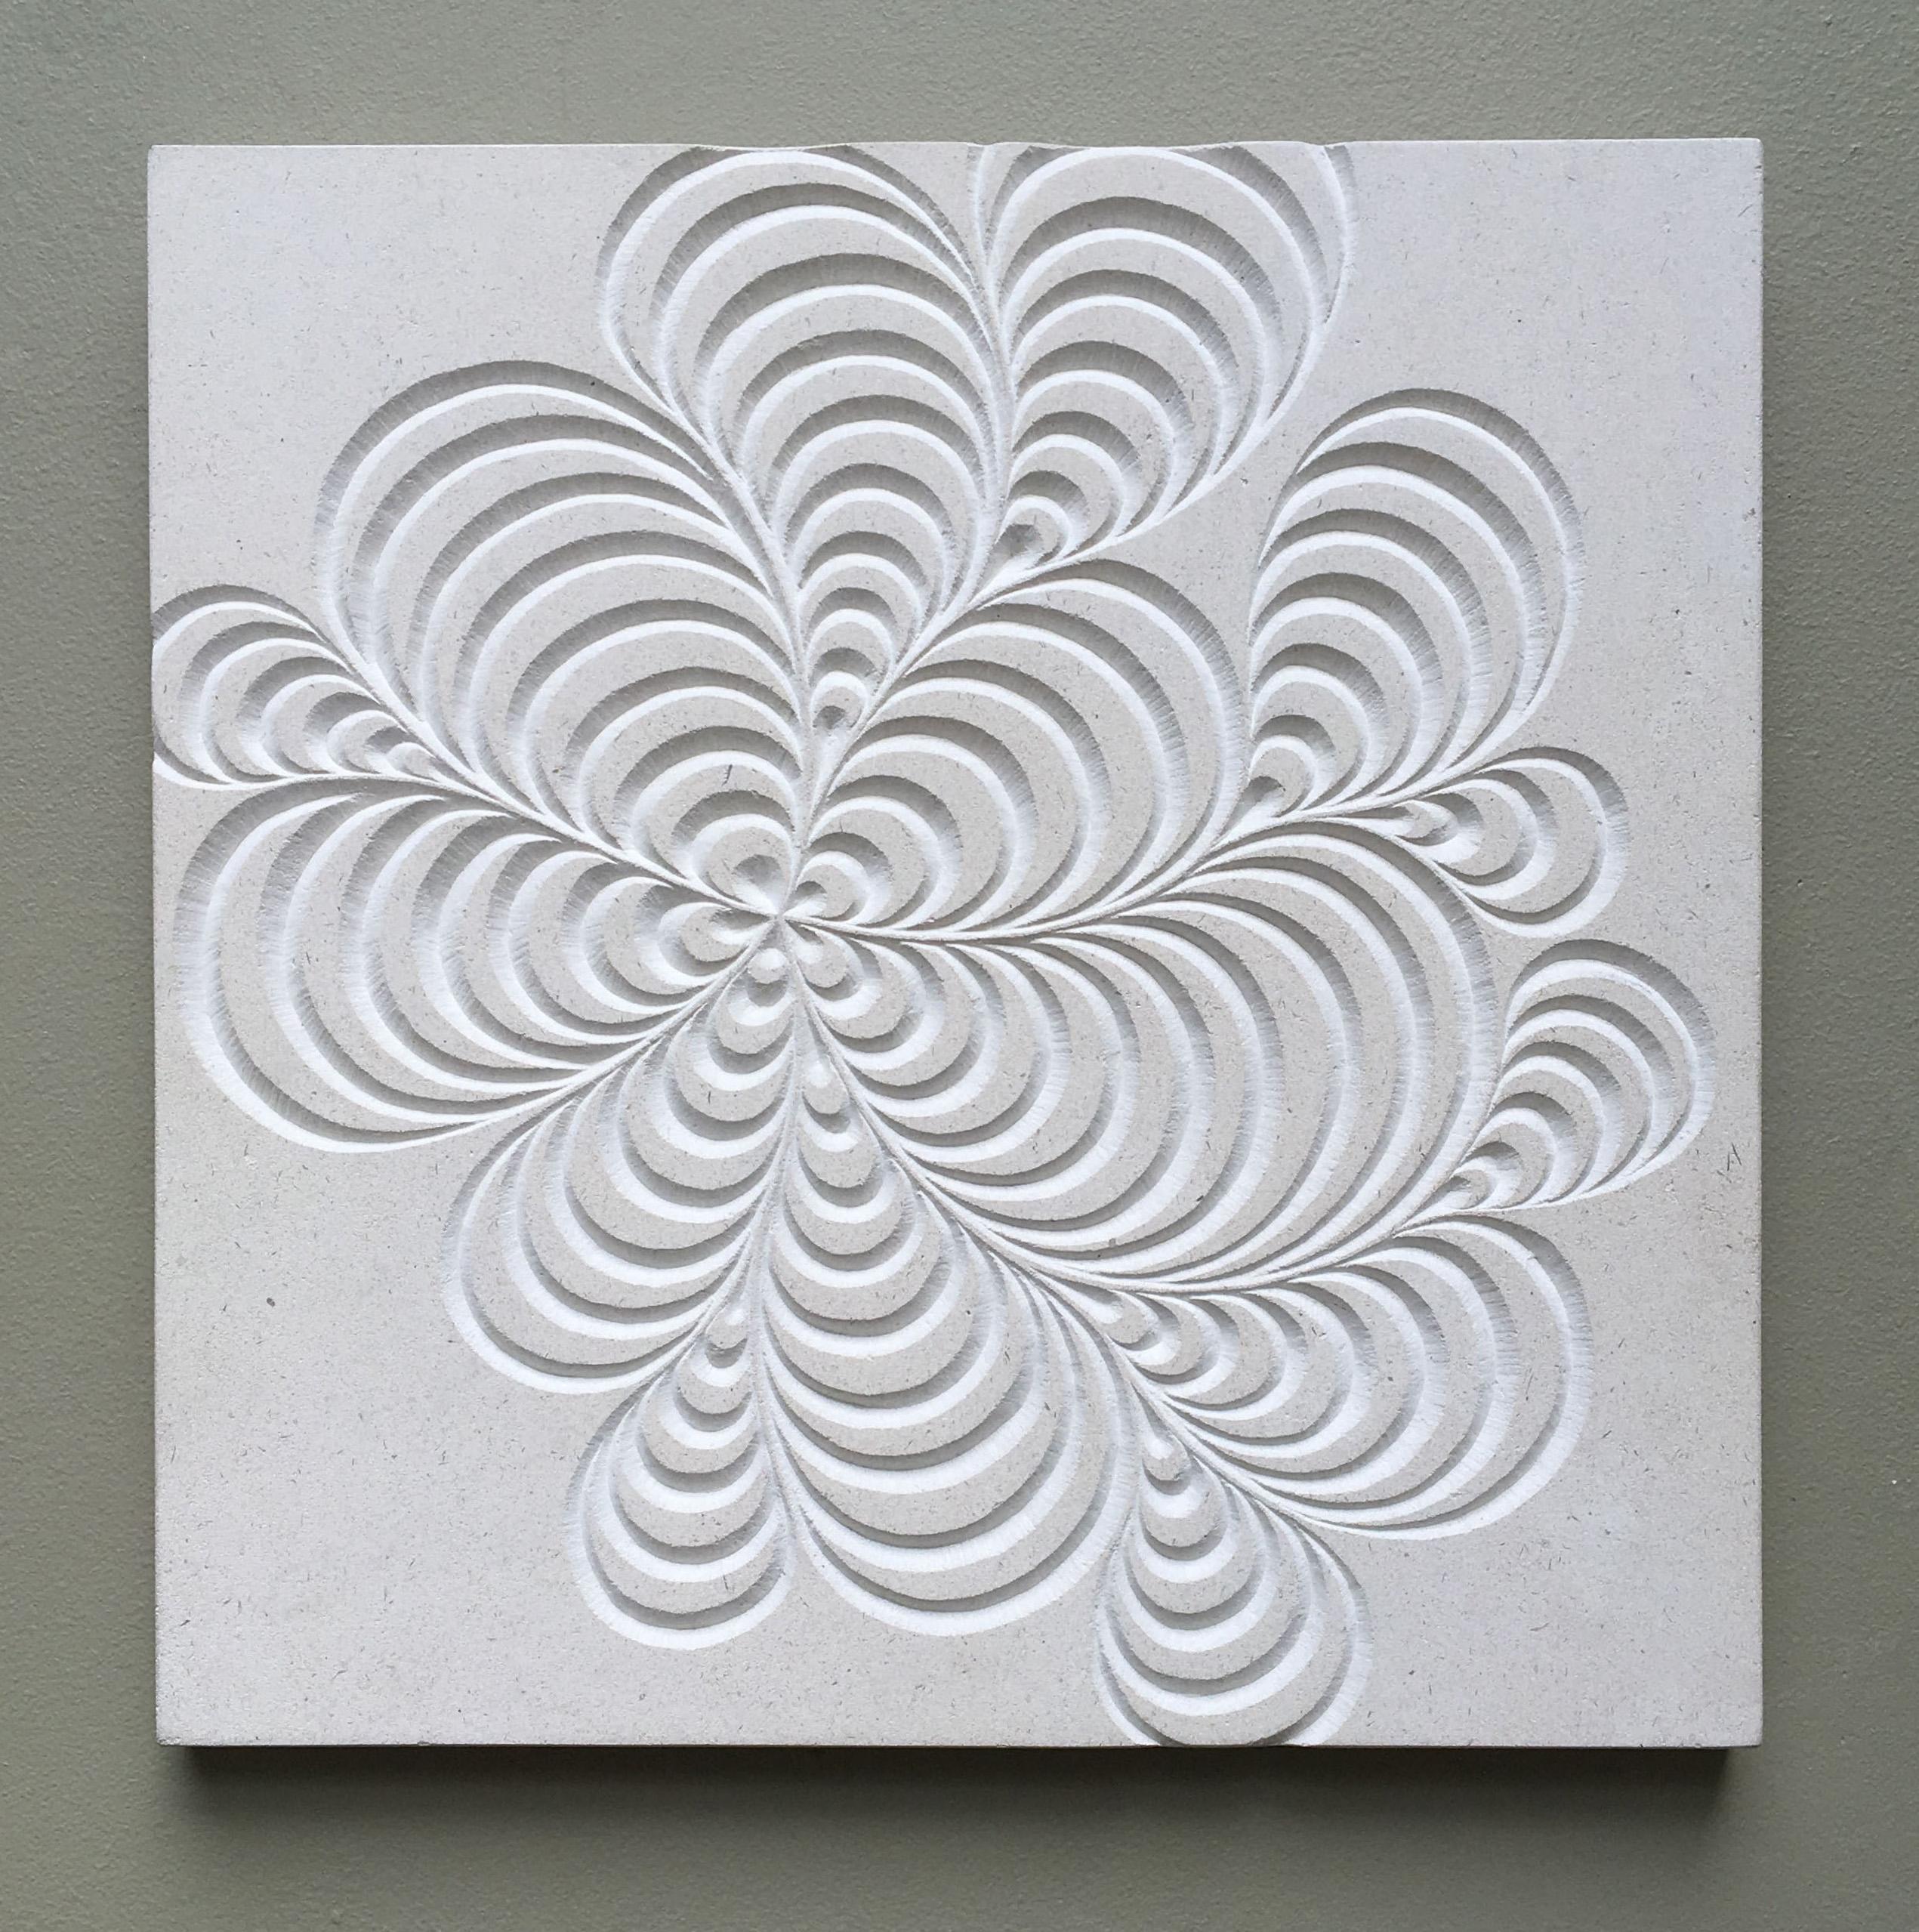 Zentangle doodle carving into Portland Limestone